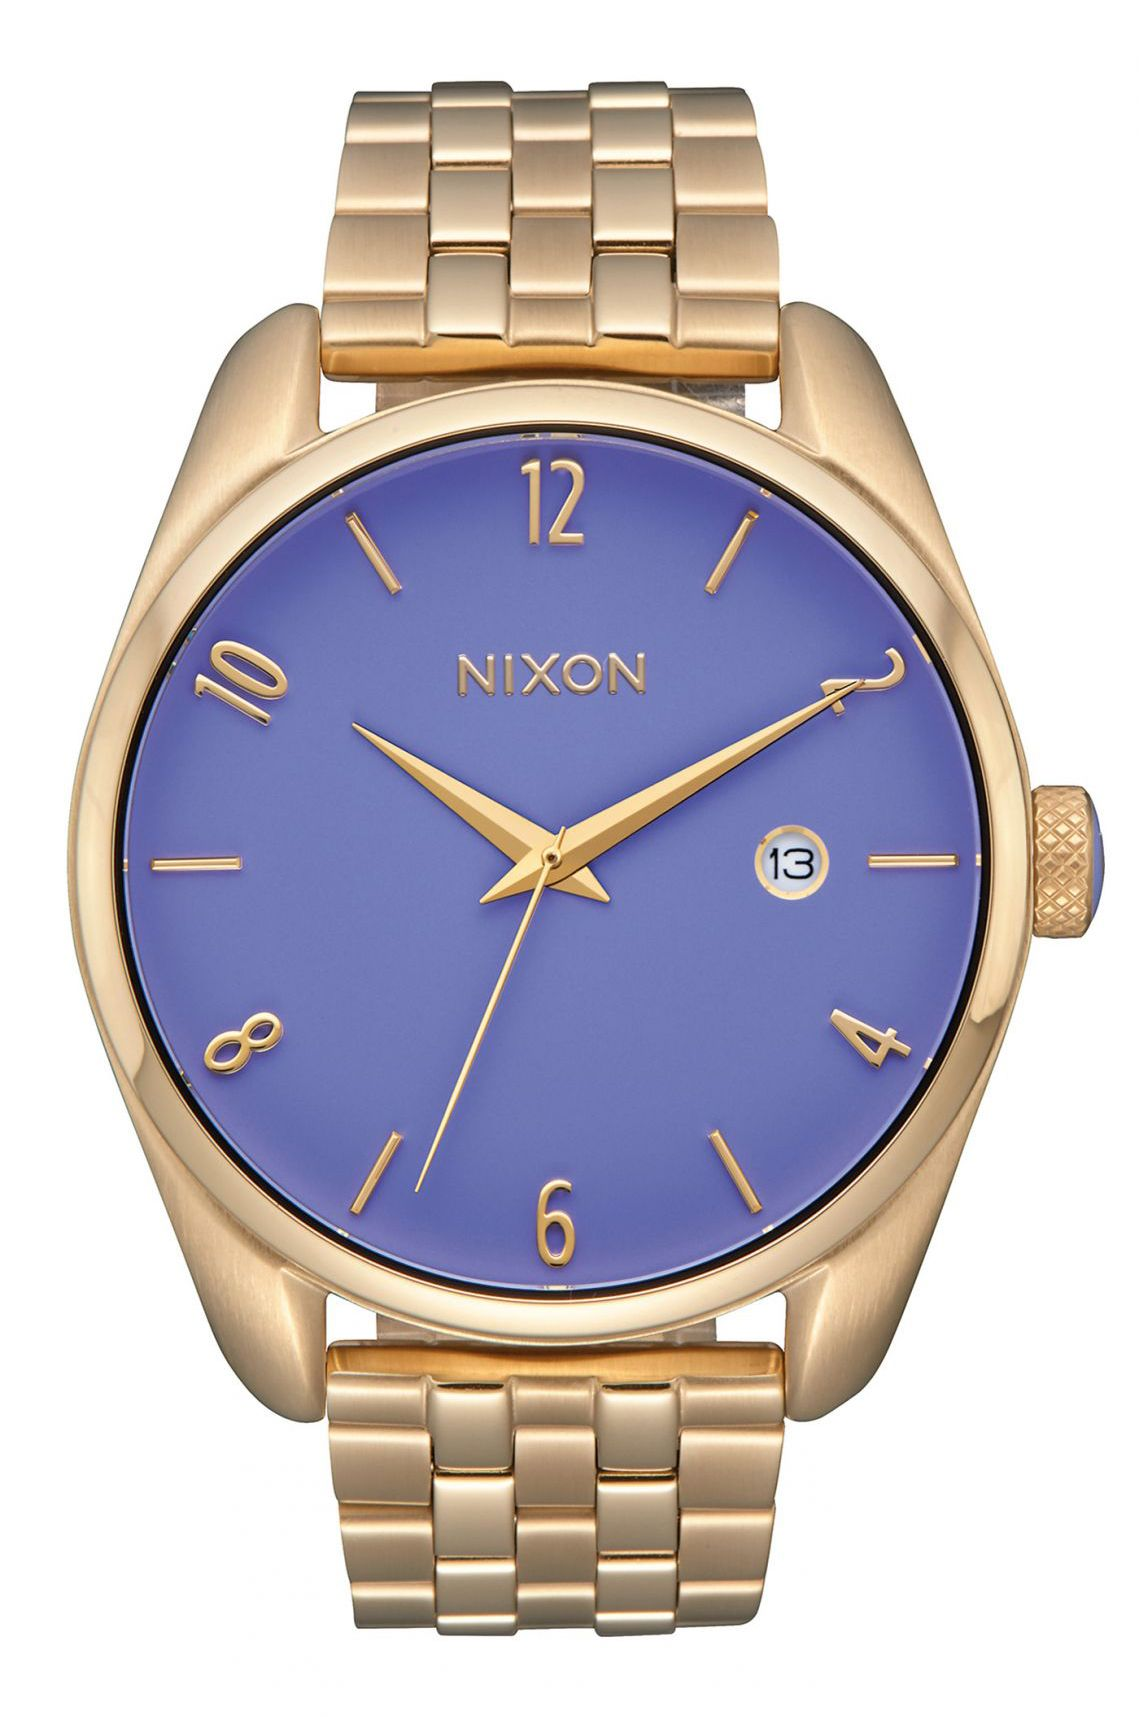 Nixon Watch BULLET Light Gold / Lavender